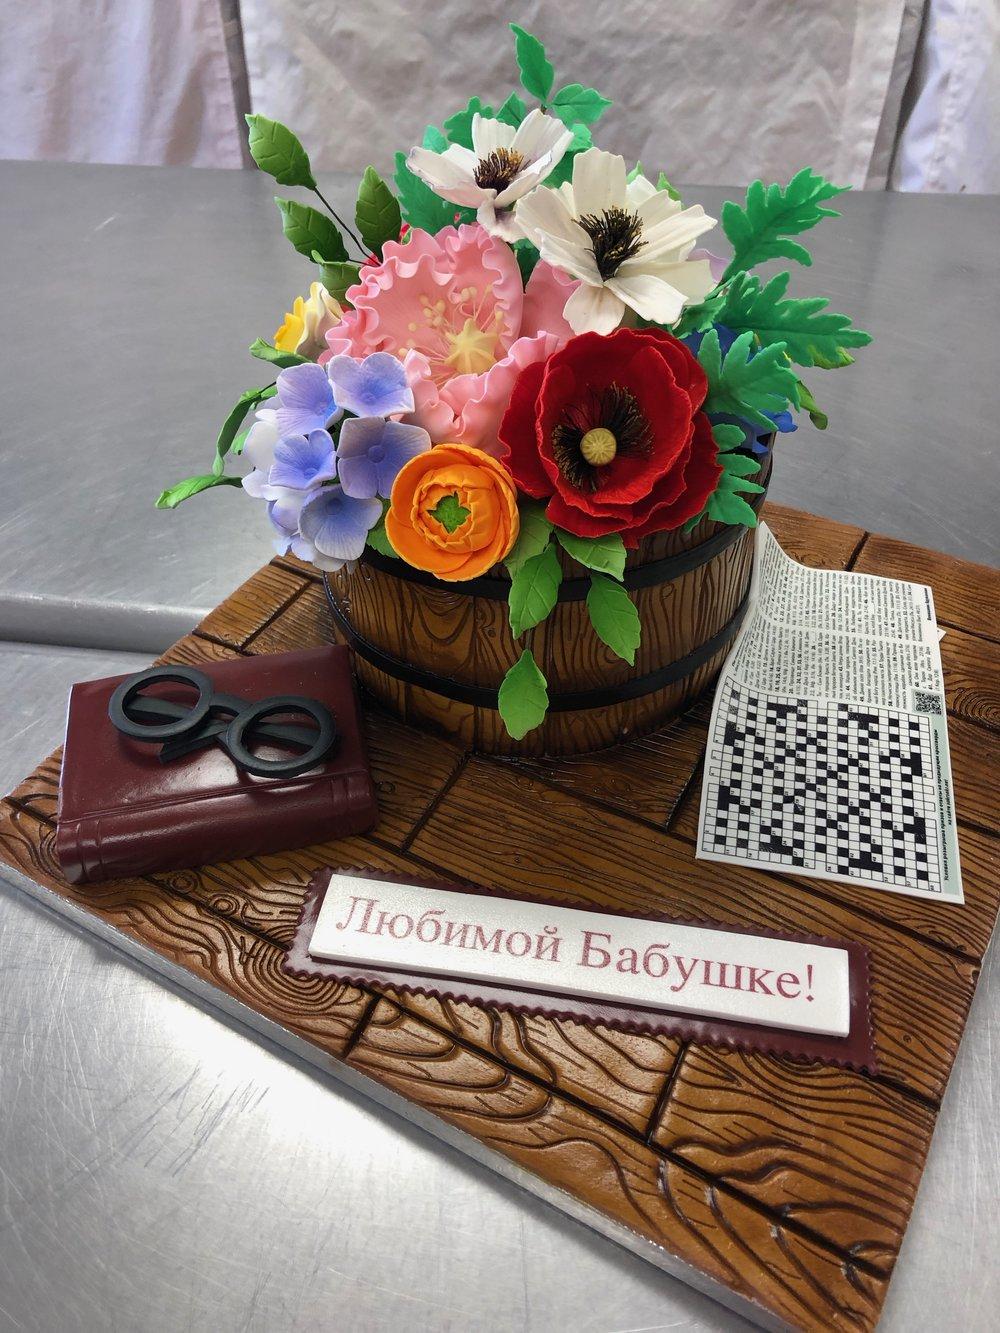 Barrel Birthday Cake New Jersey